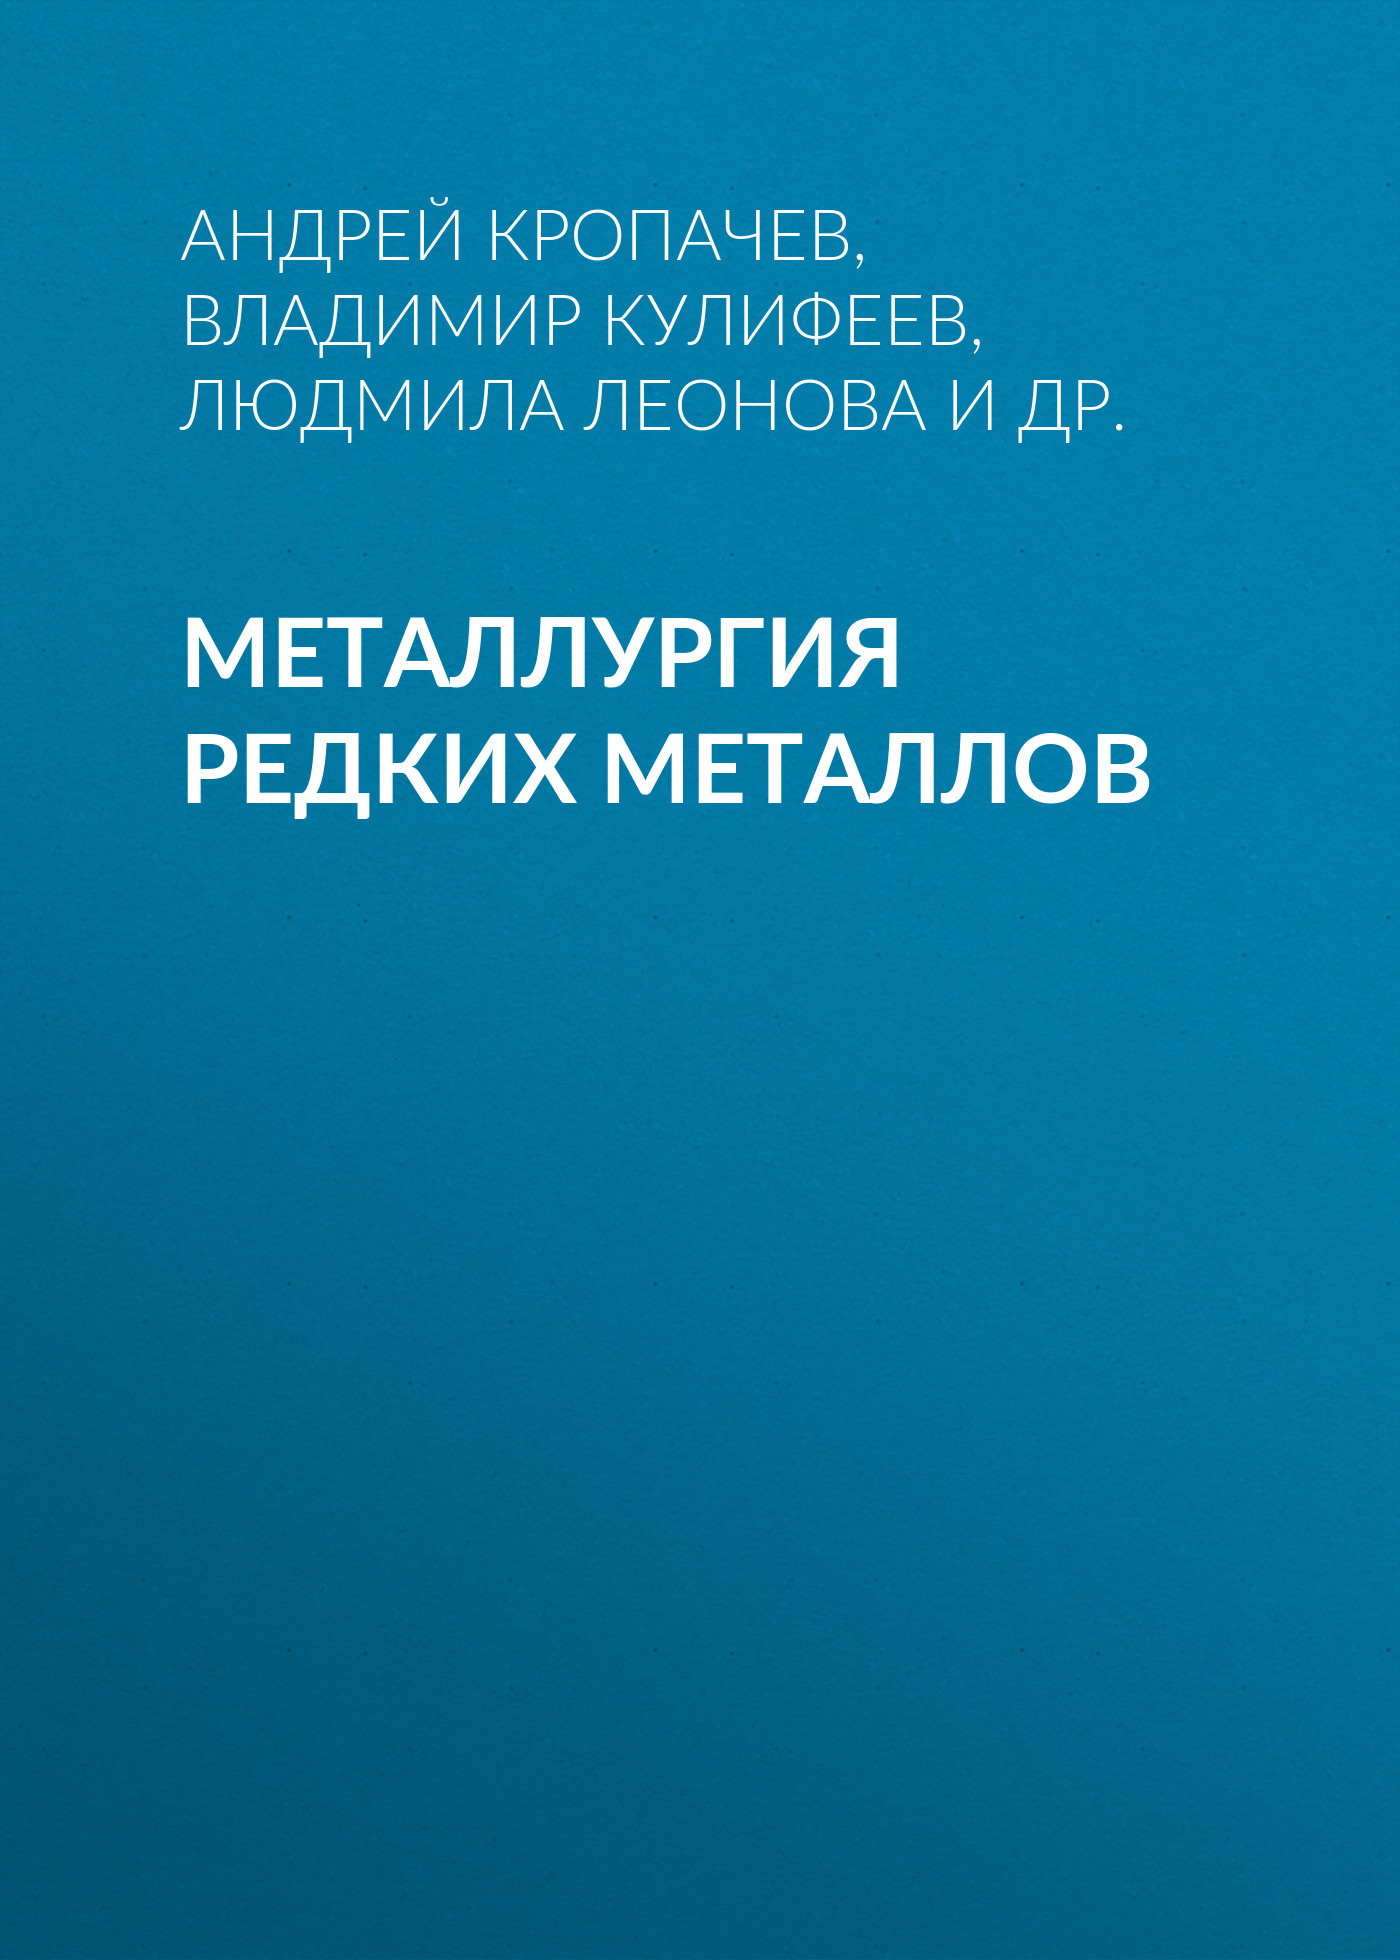 Владимир Кулифеев Металлургия редких металлов